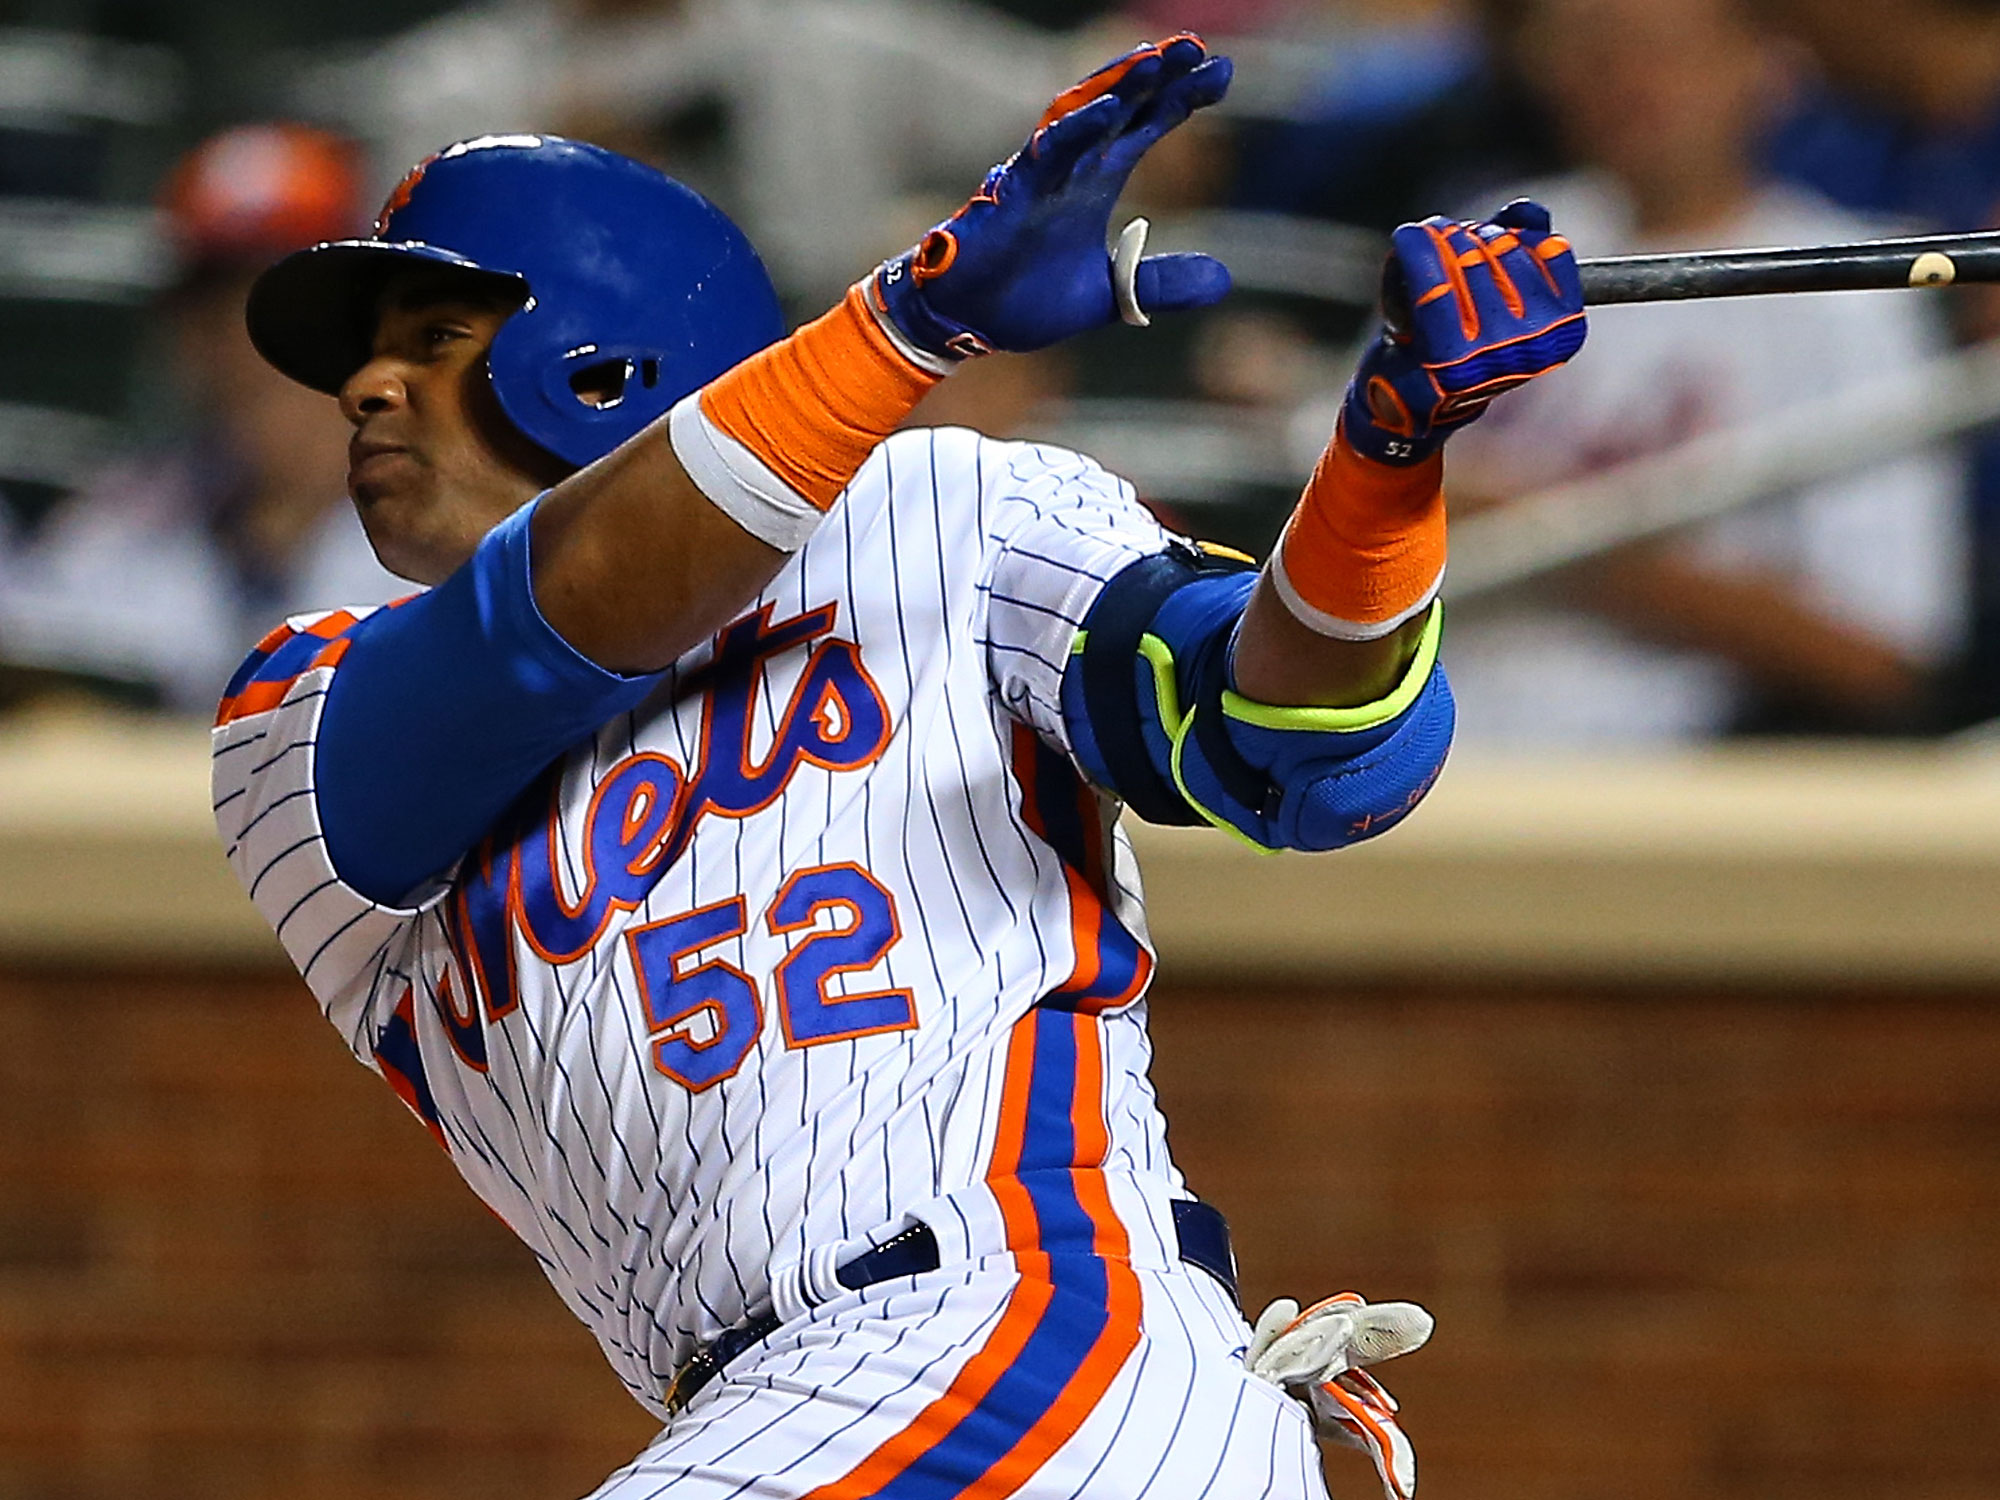 Yoenis Cespedes, New York Mets